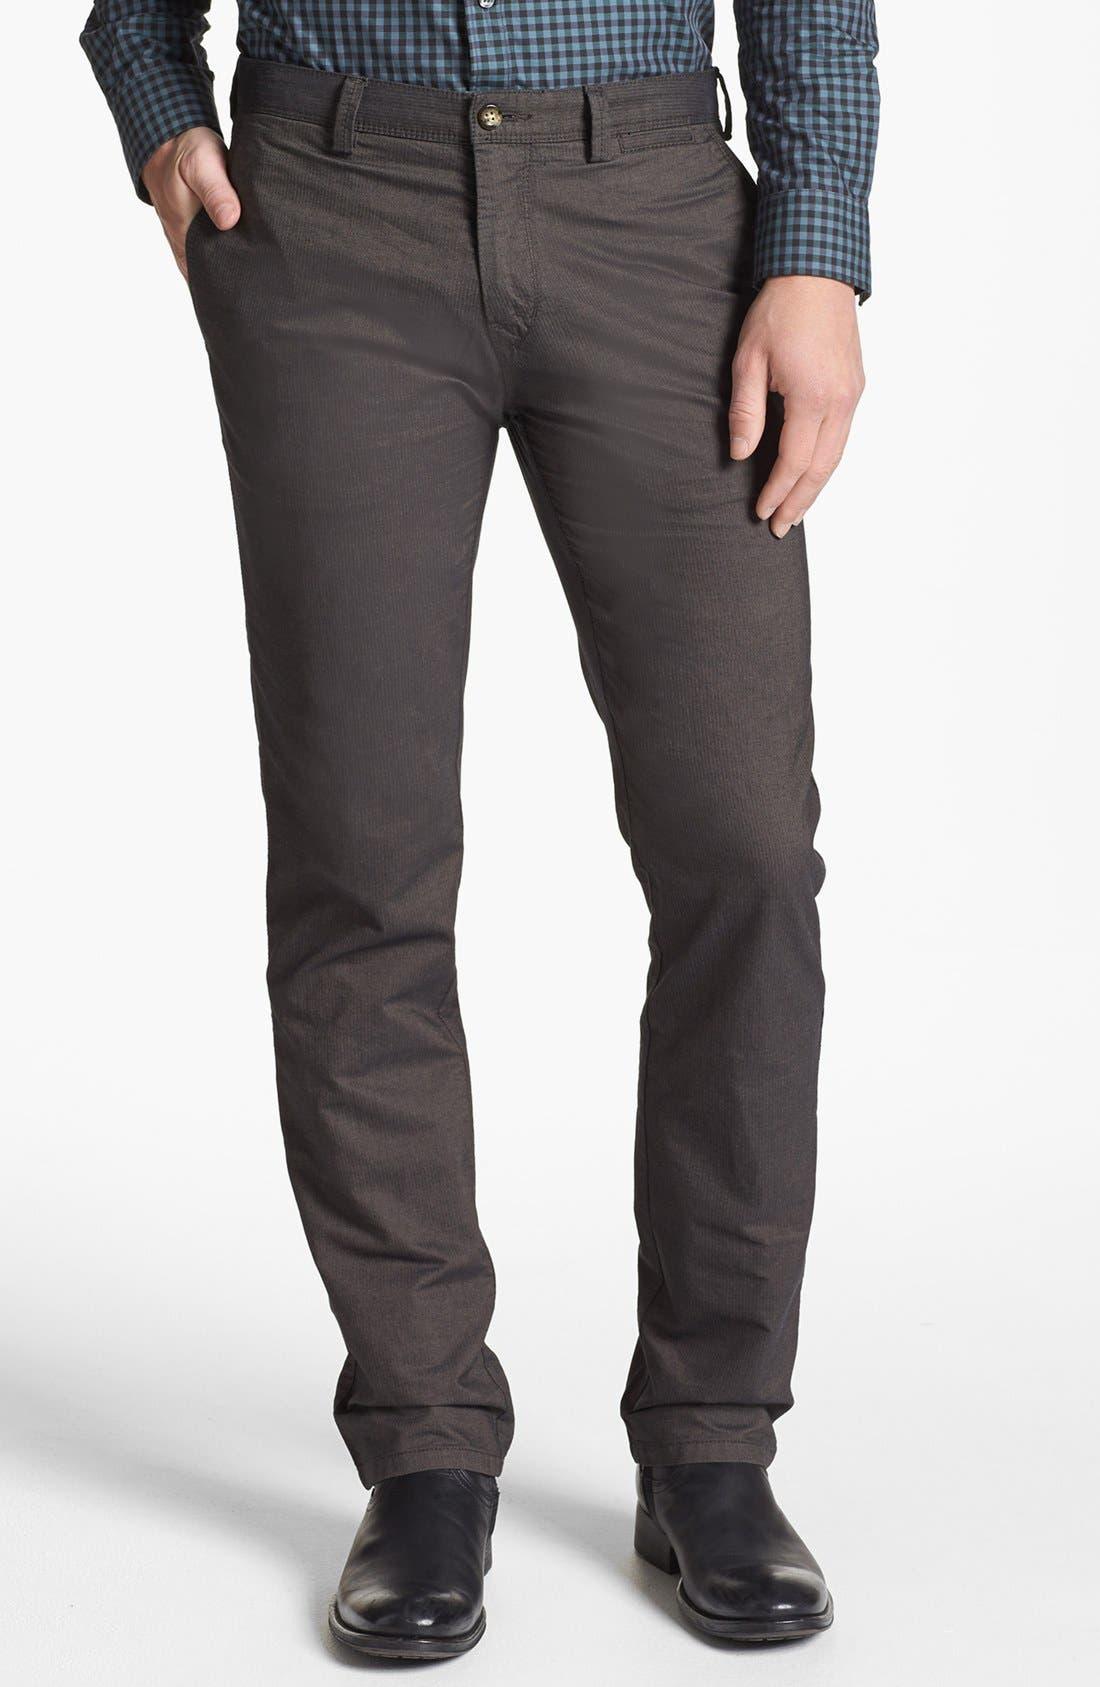 Alternate Image 1 Selected - BOSS HUGO BOSS 'Crigan 1-7-W' Regular Fit Pants